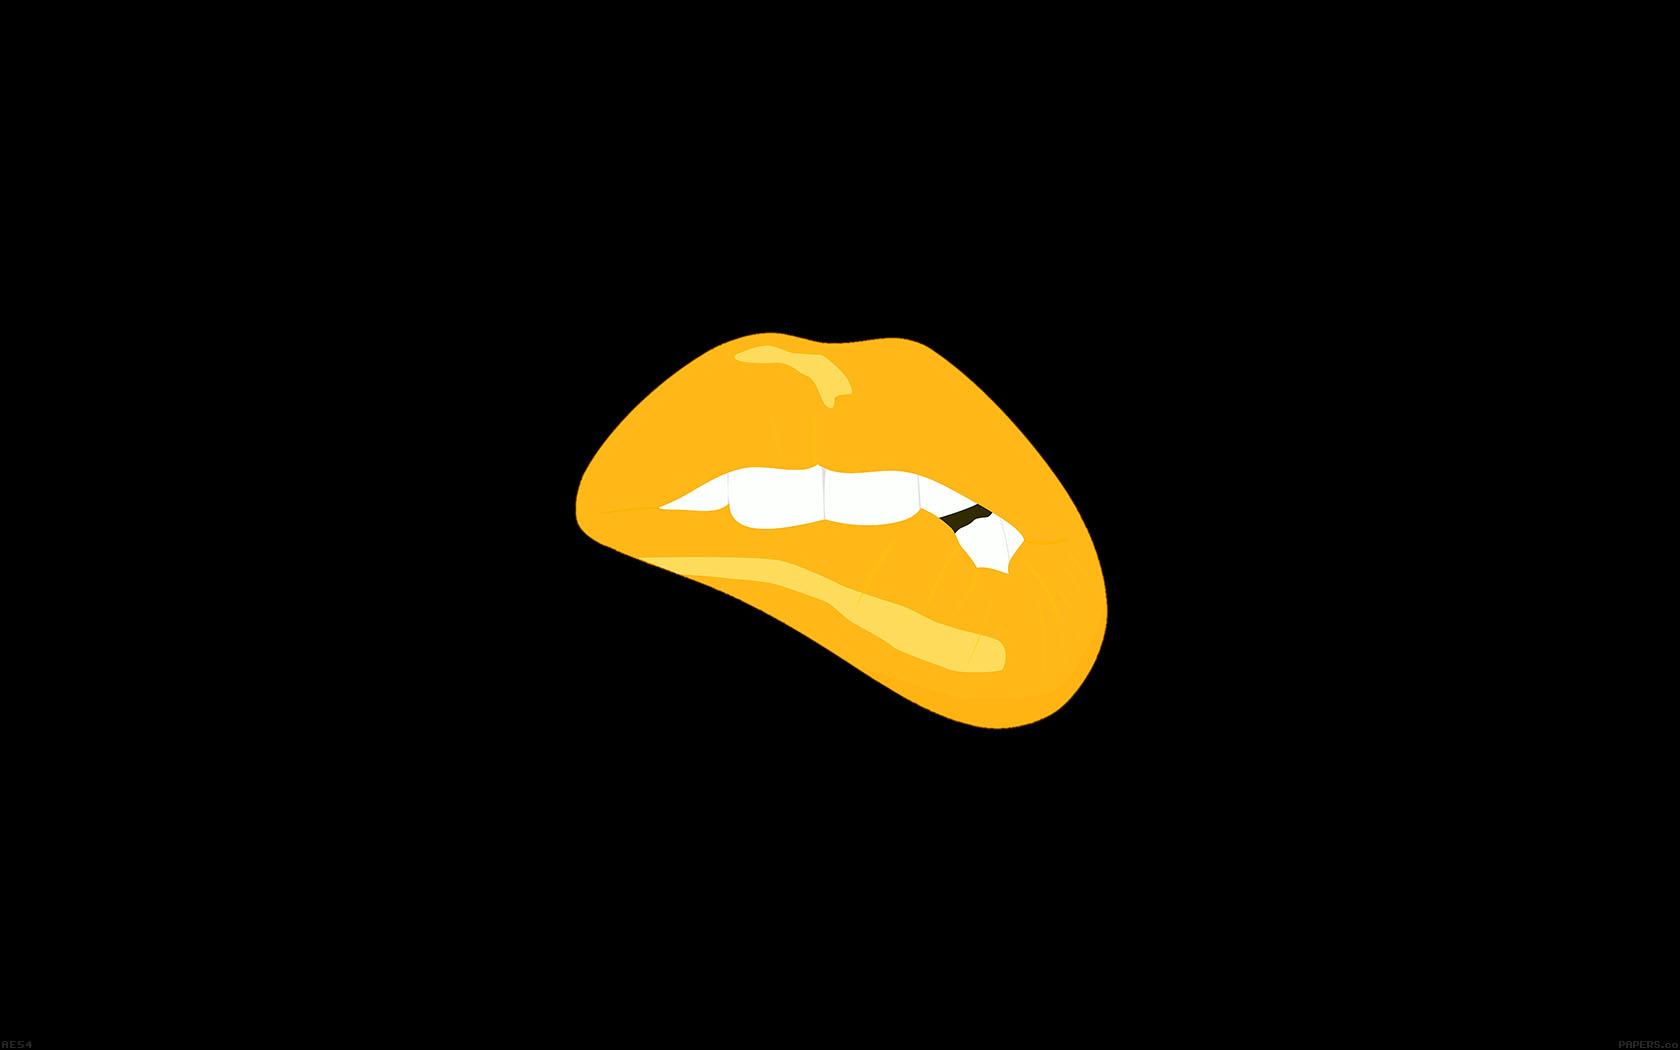 Ae54 Biting Lips Gold Black Background Minimal Art Wallpaper